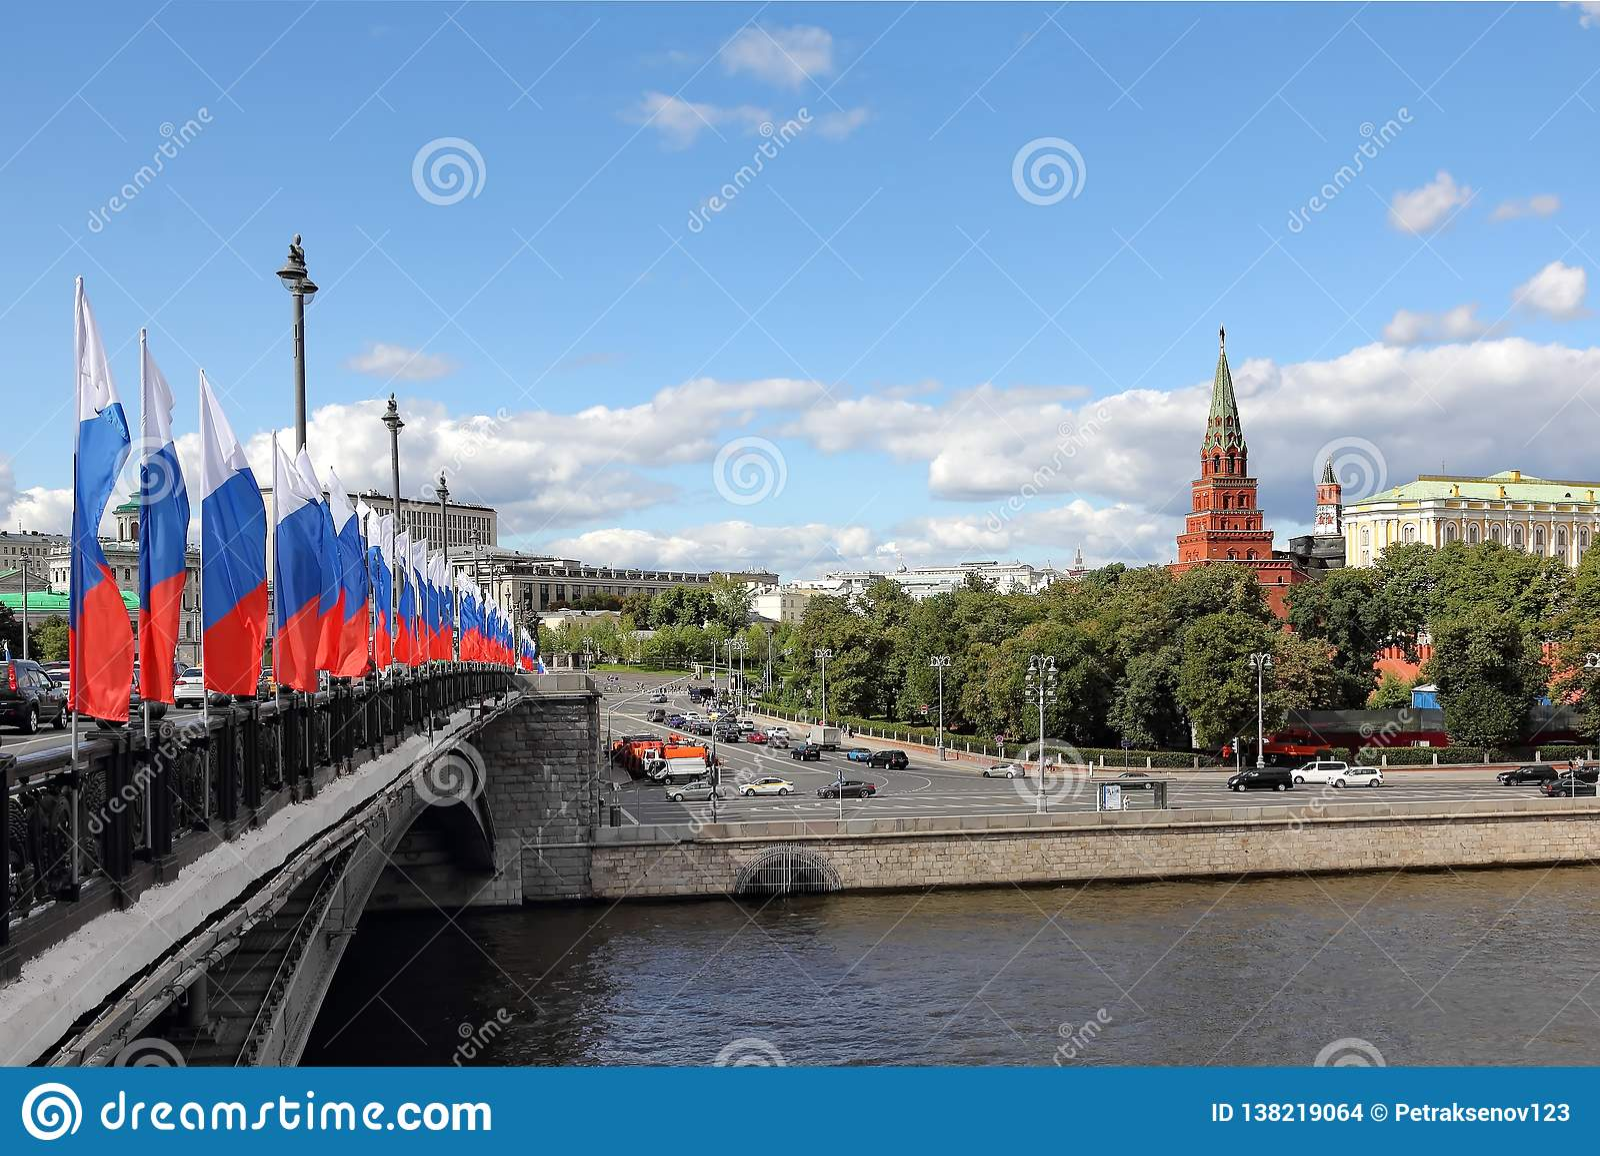 Bolshoy Kamenny Bridge, Moscow River and Moscow Kremlin